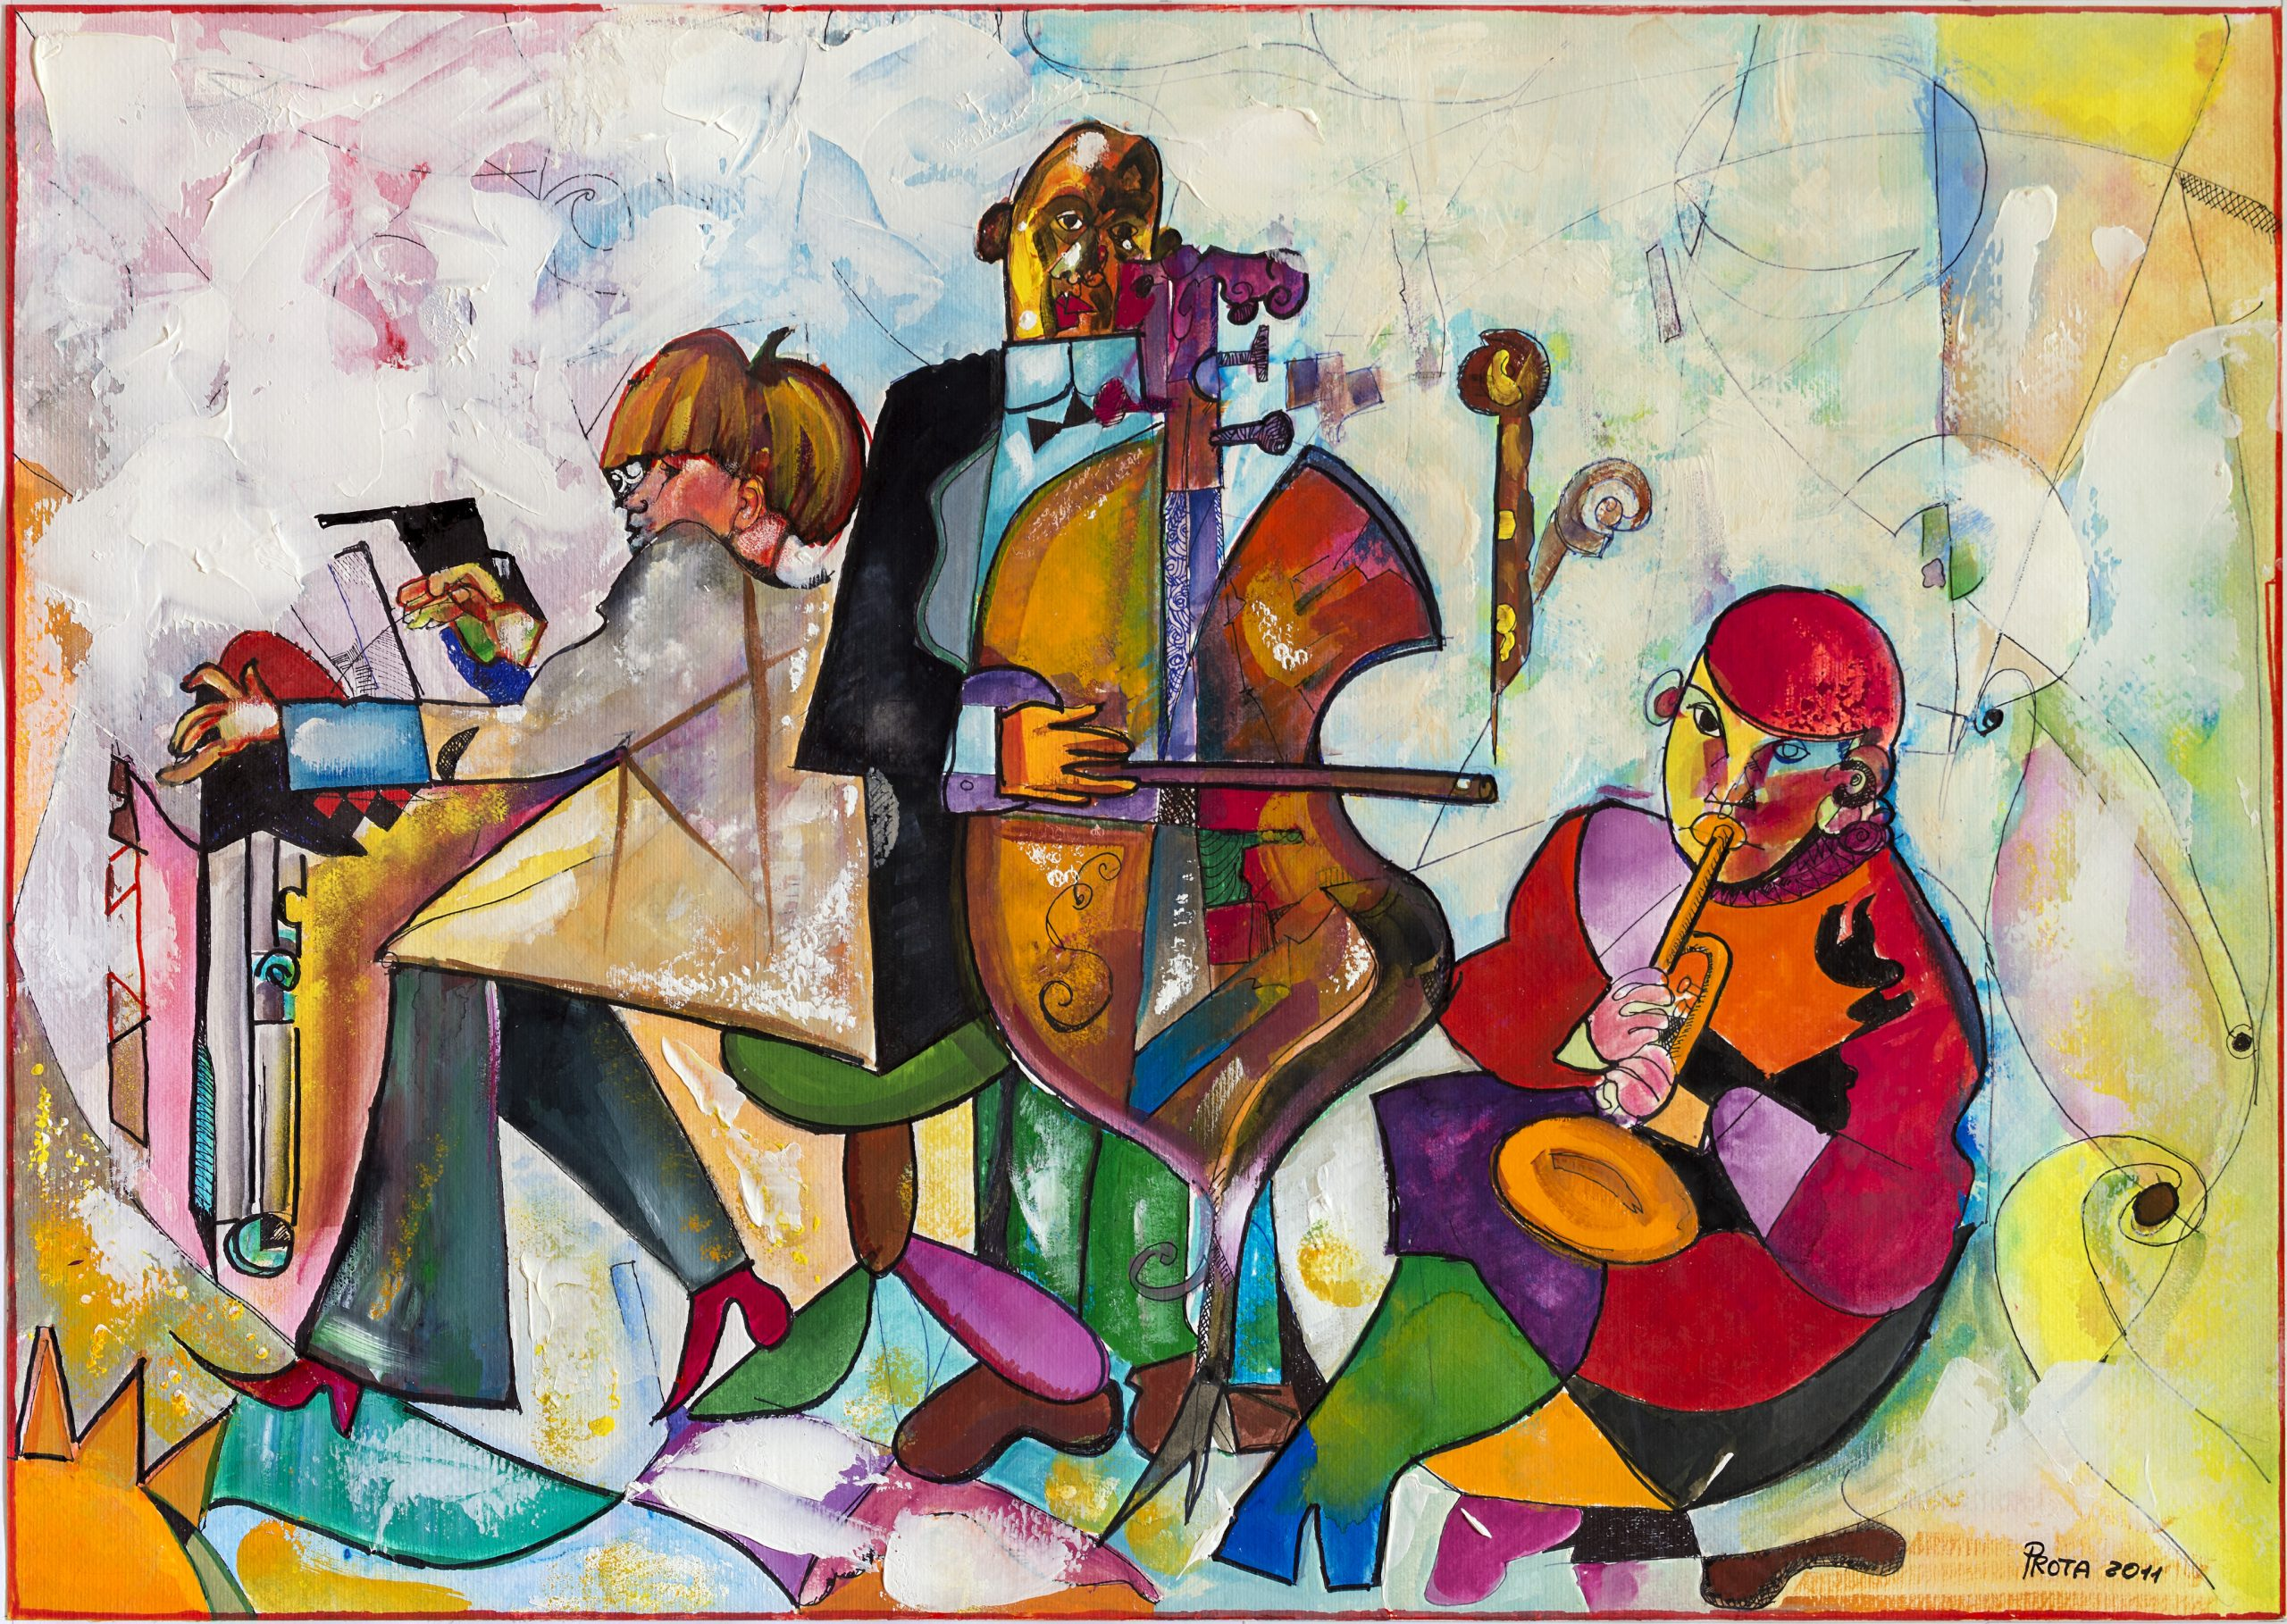 2011 - Concerto (Tempera) - 49x69 cm